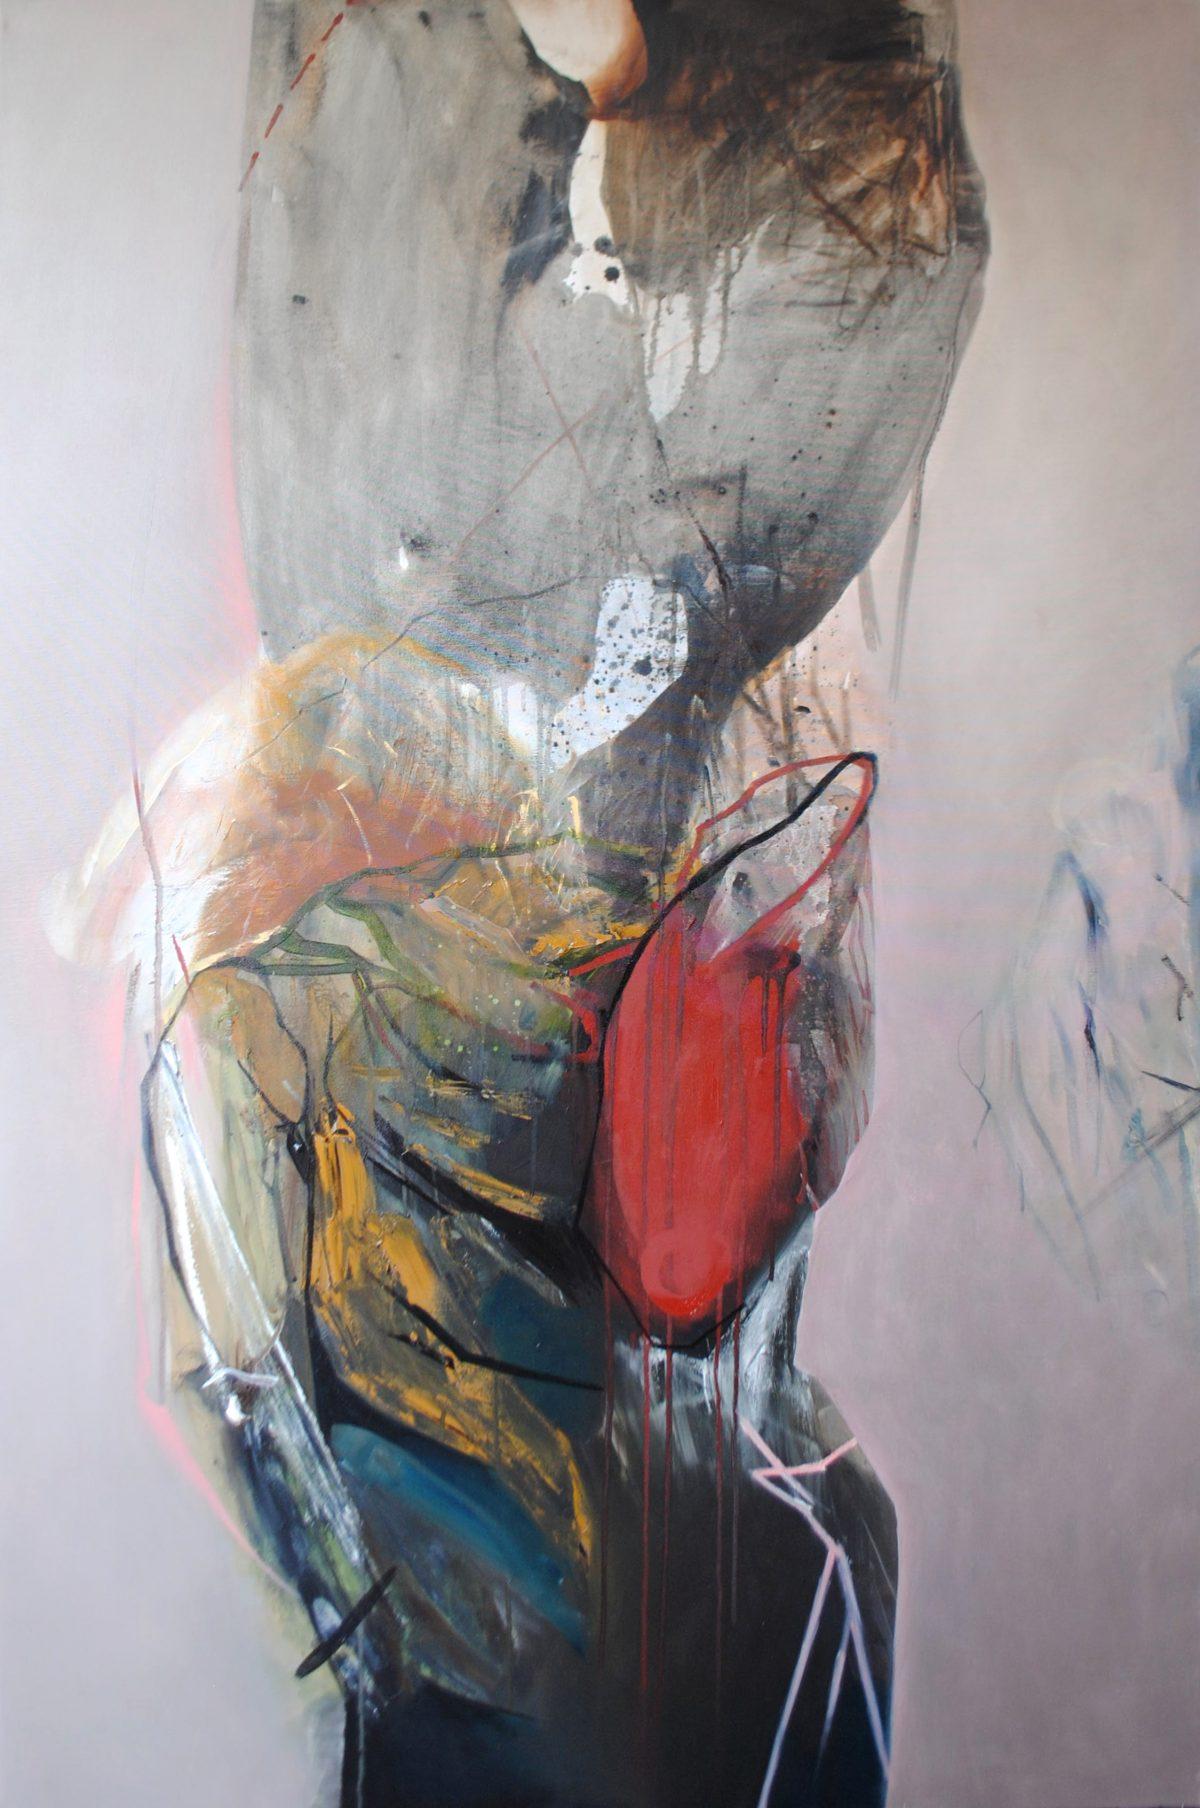 Fragments 3, acrylic and oil on canvas, 2019, 100x150 cm